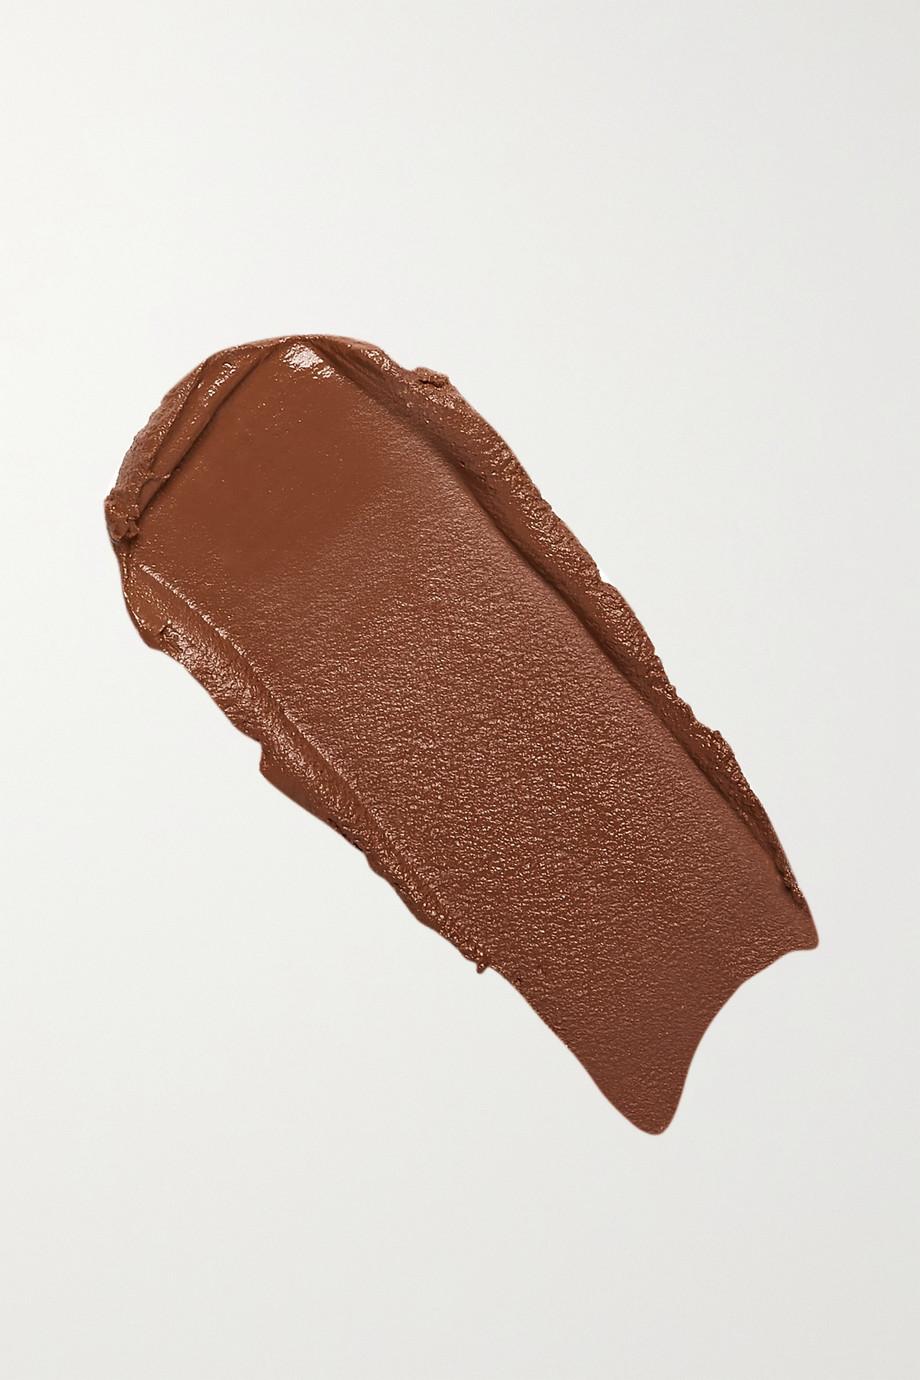 Kjaer Weis Invisible Touch Concealer – D340 – Concealer